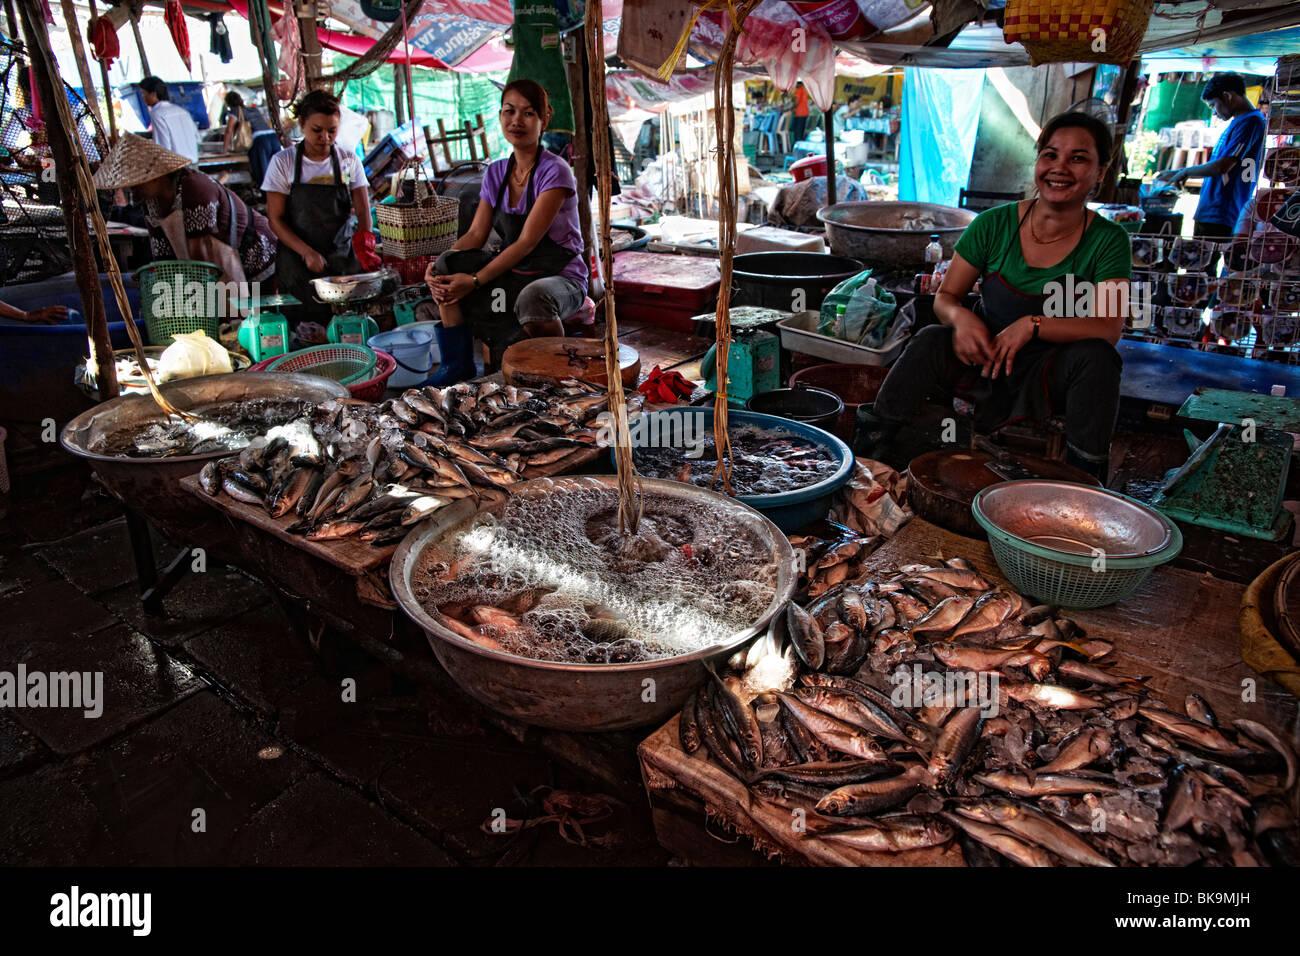 Women selling fish, food market, Vientiane, Laos - Stock Image